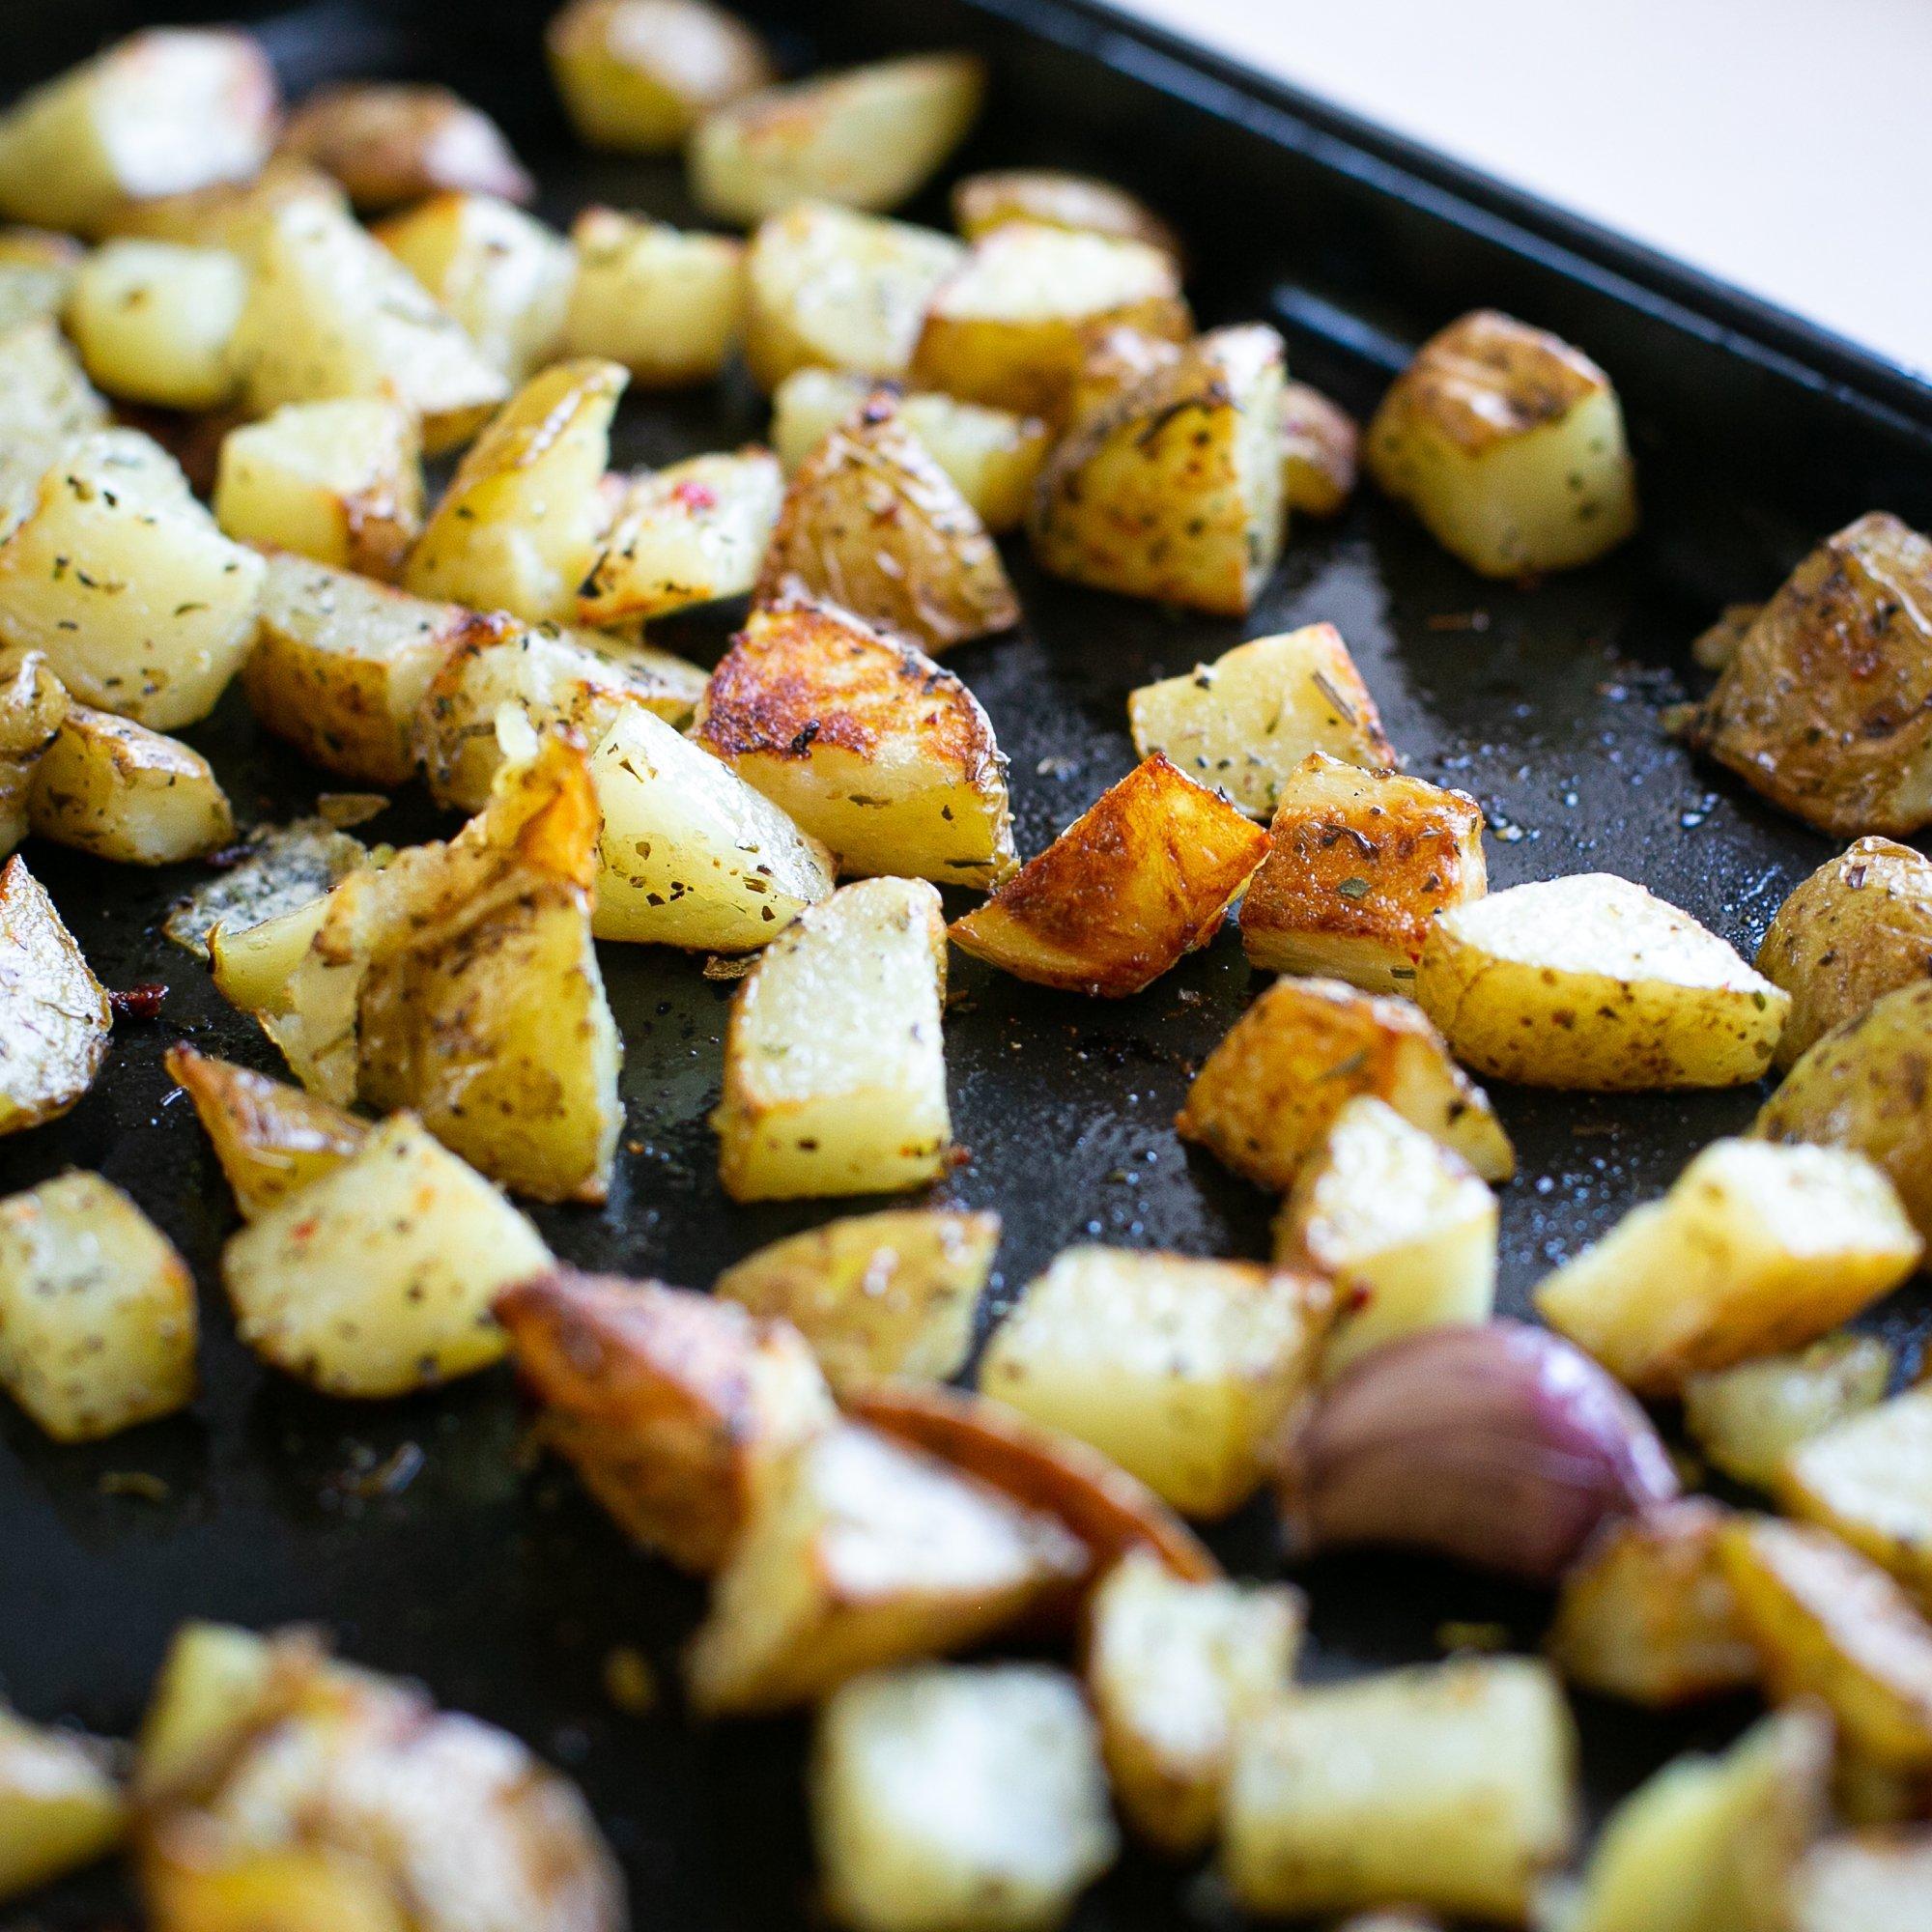 freshly cooked crispy homemade oven chips